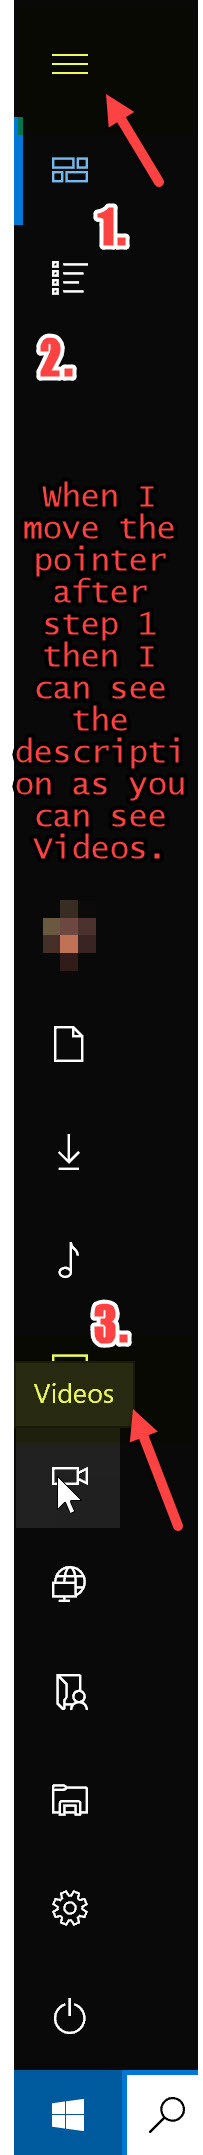 Start Menu-Videos Description Appearing.jpg